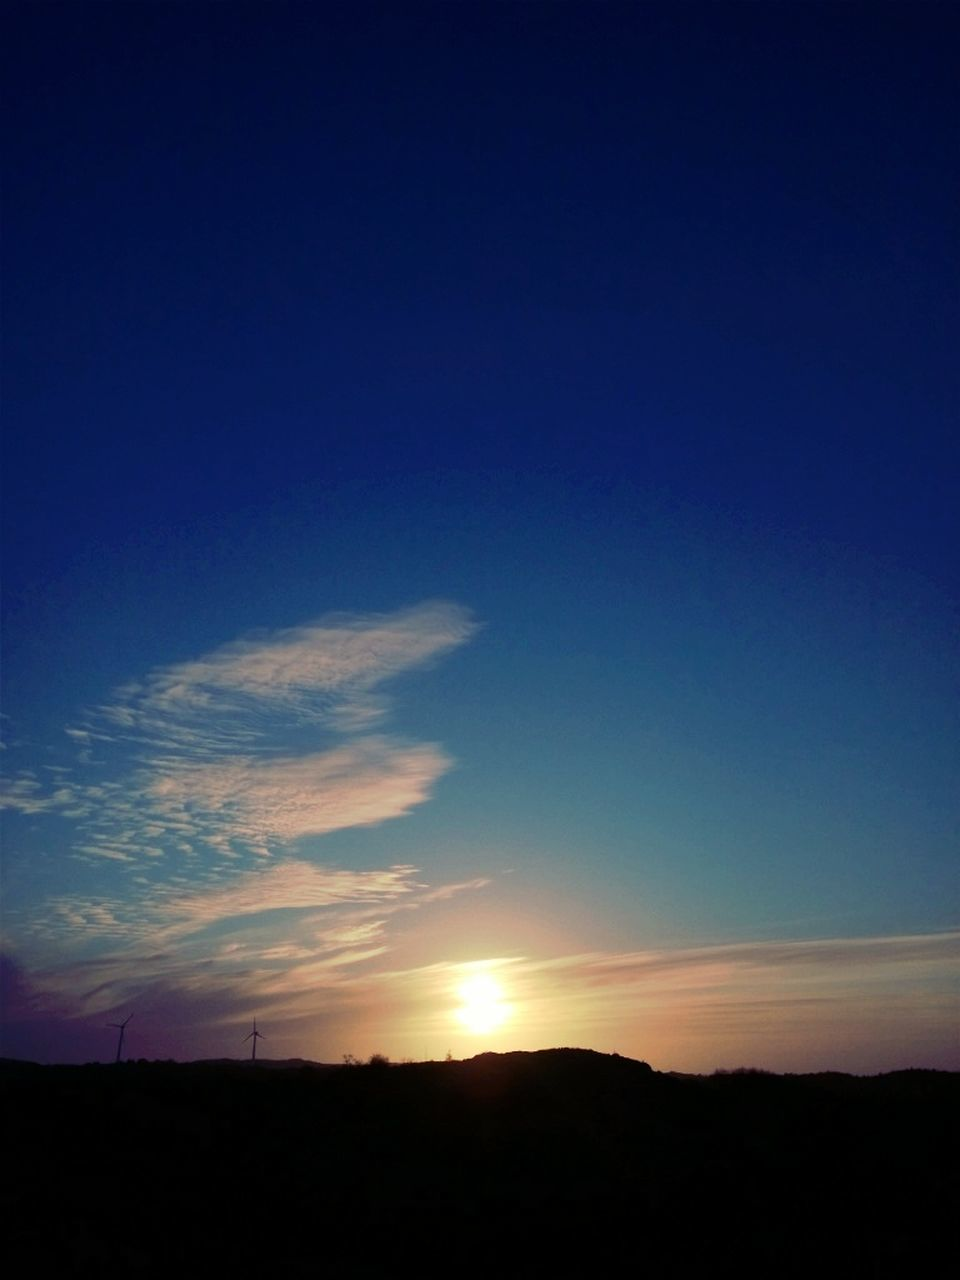 Silhouette landscape against blue sky at sunset